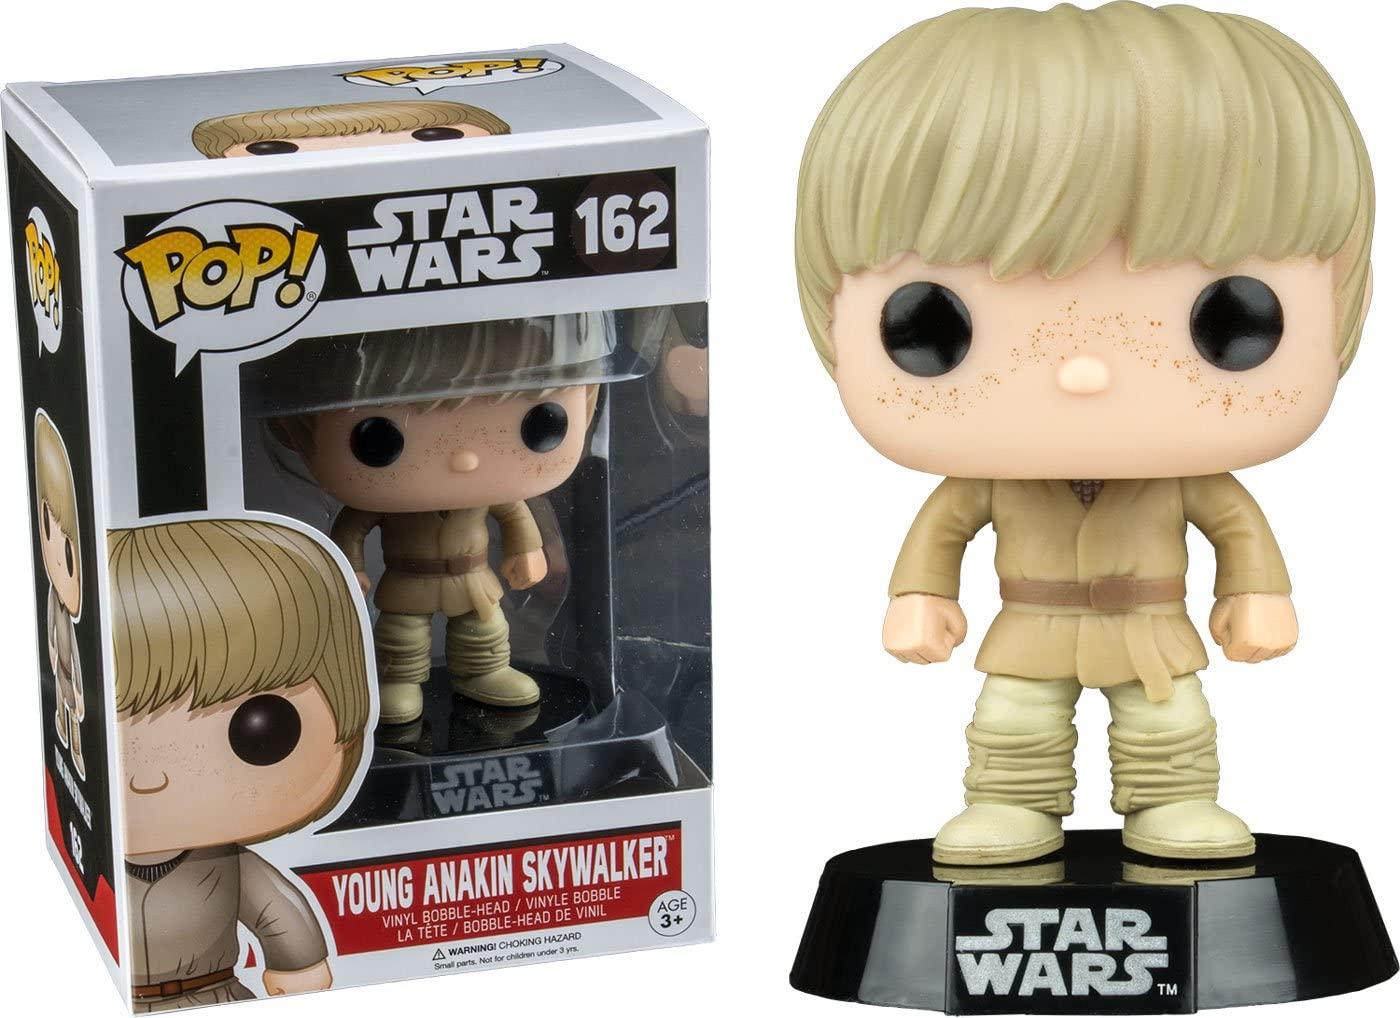 Young Anakin Skywalker -